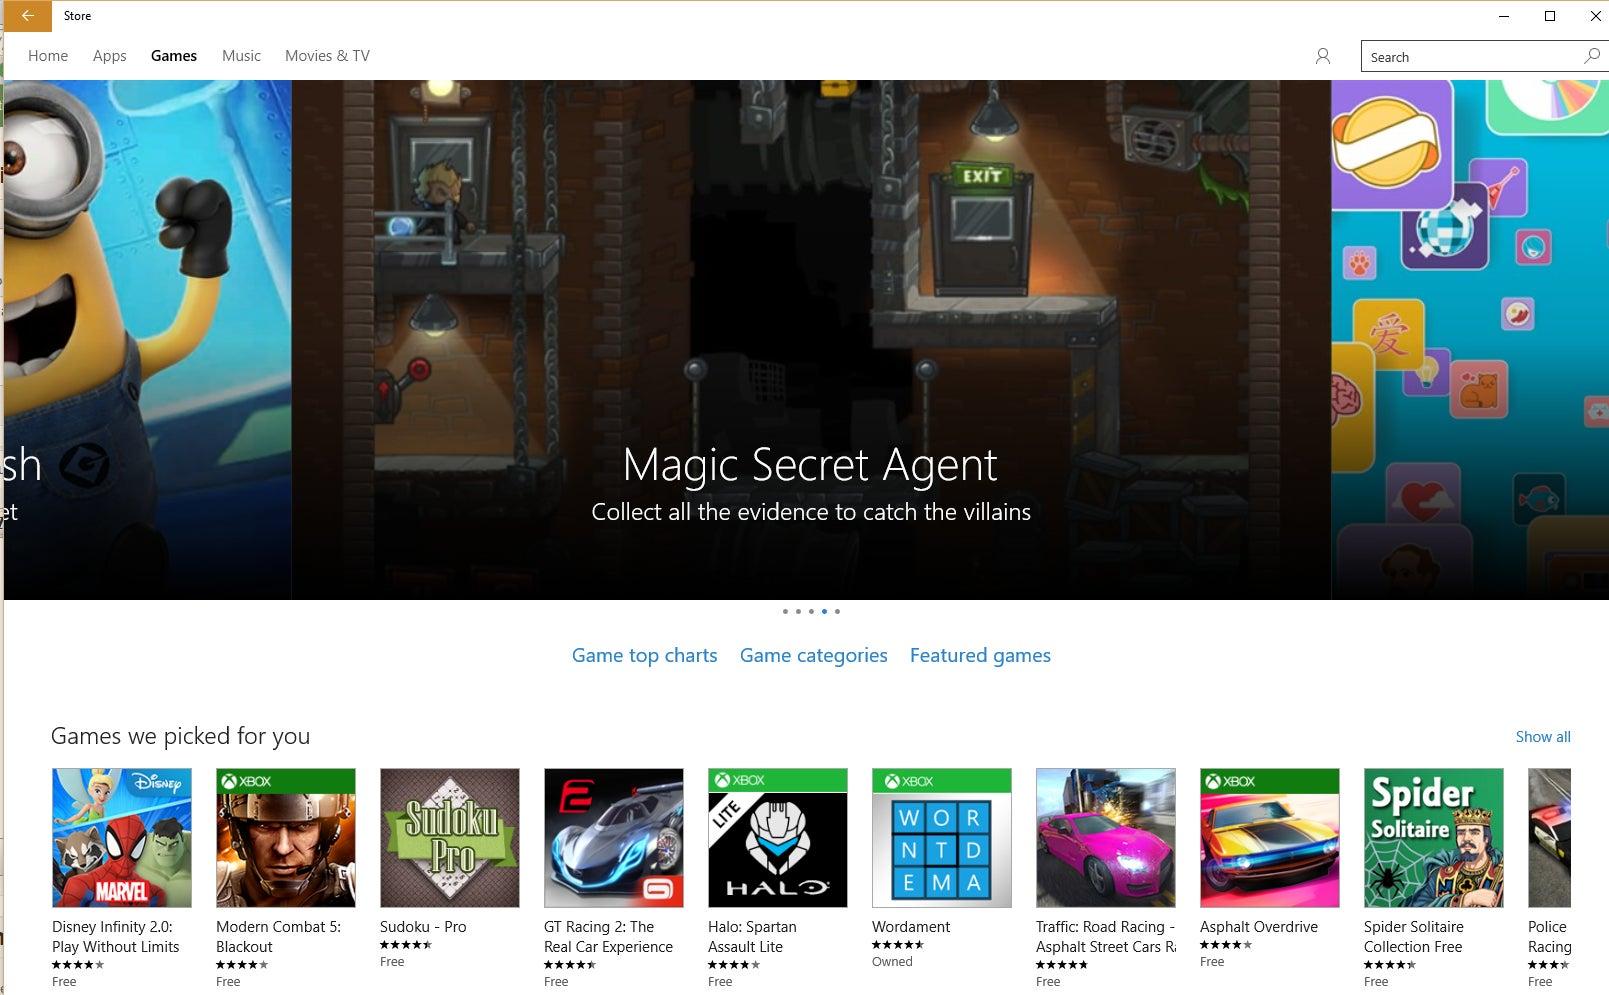 Free microsoft games for windows 10 | Windows 10 Games  2019-02-24